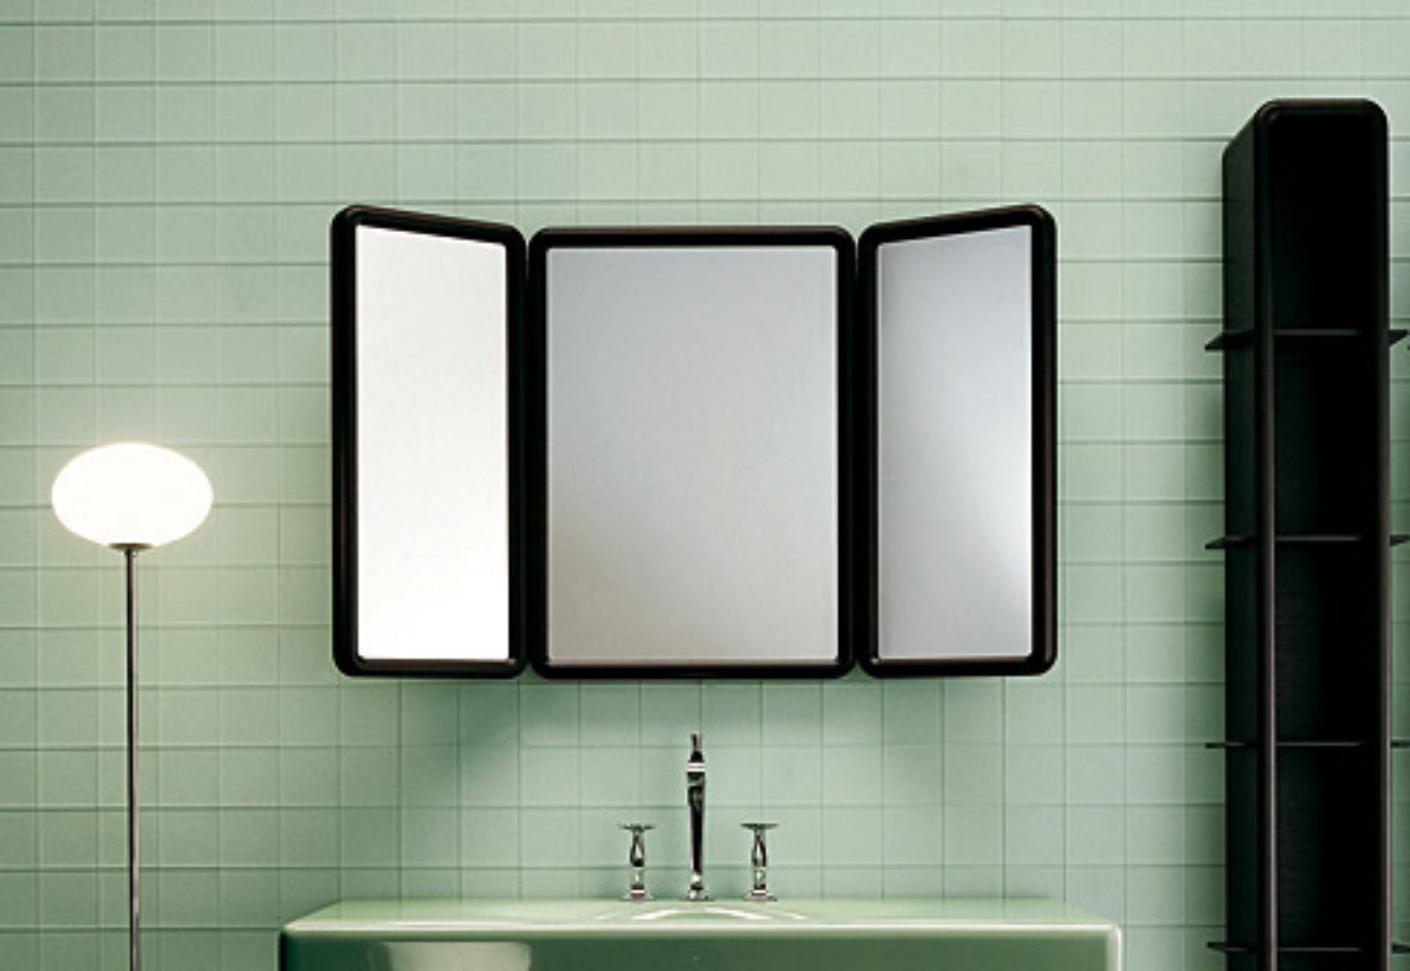 Folding Bathroom Mirror In Well Known Tri Fold Bathroom Wall Mirrors (View 1 of 20)